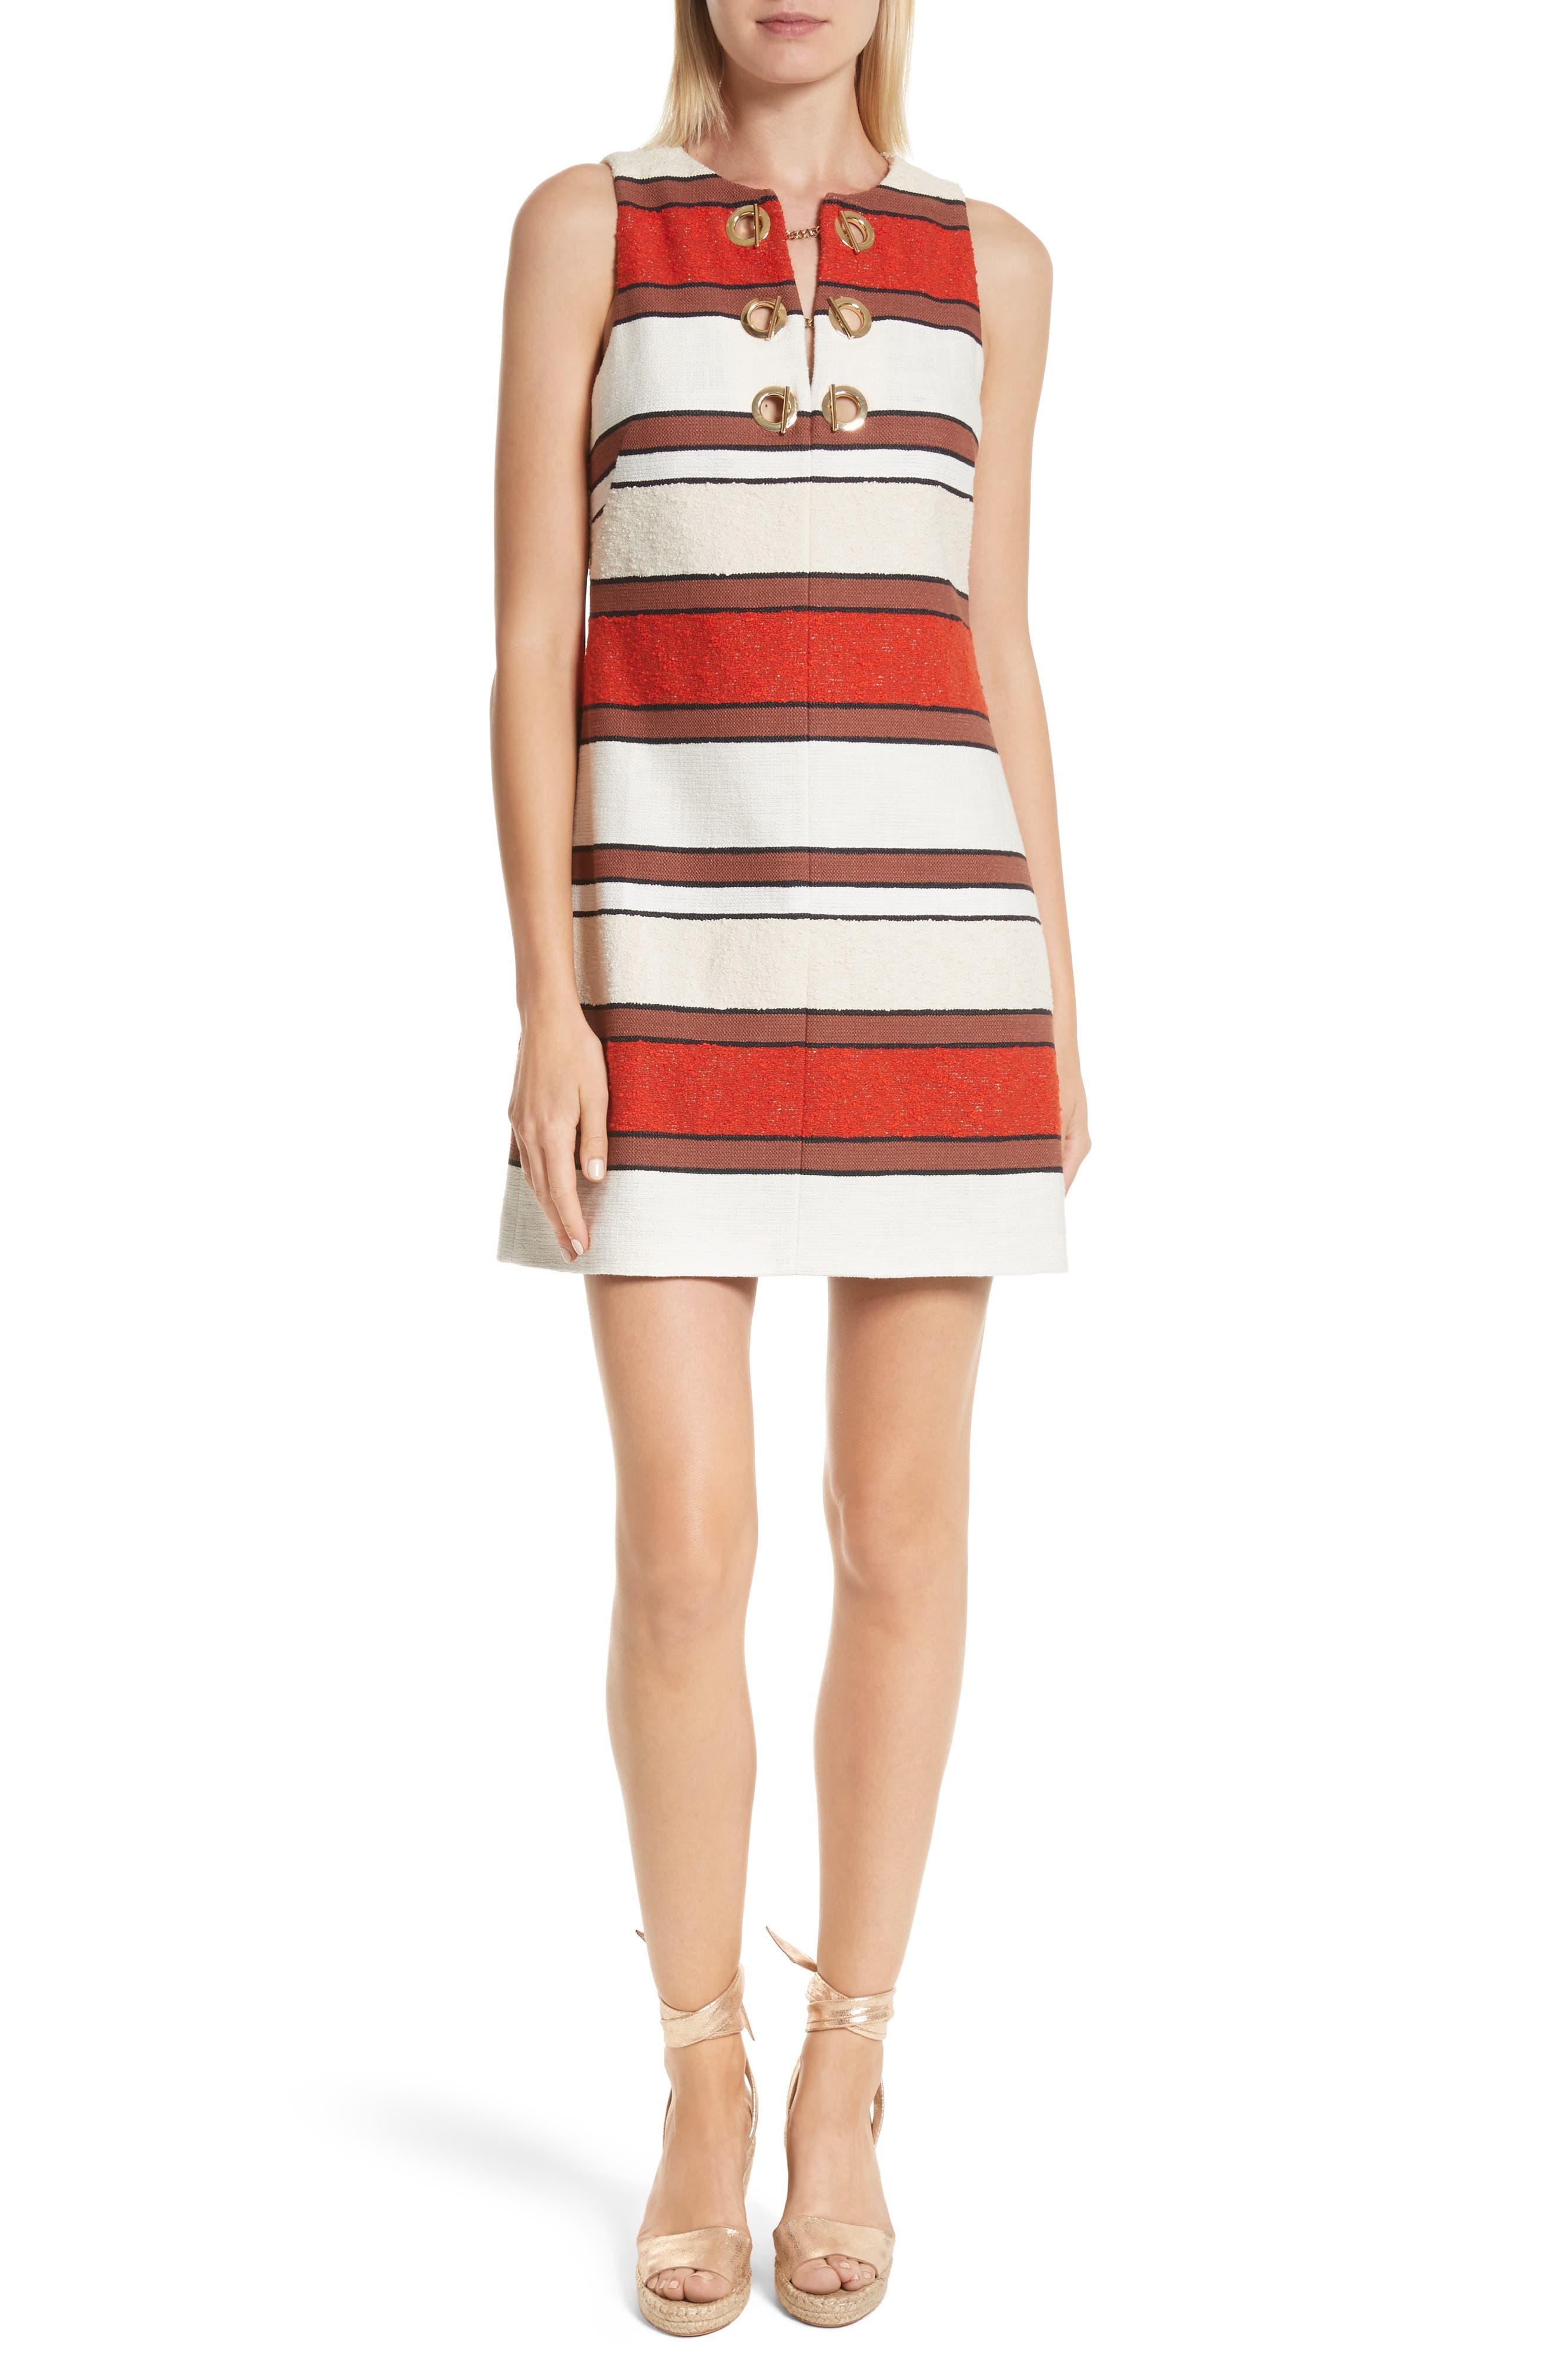 Grommet Detail Stripe Shift Dress,                             Main thumbnail 1, color,                             621